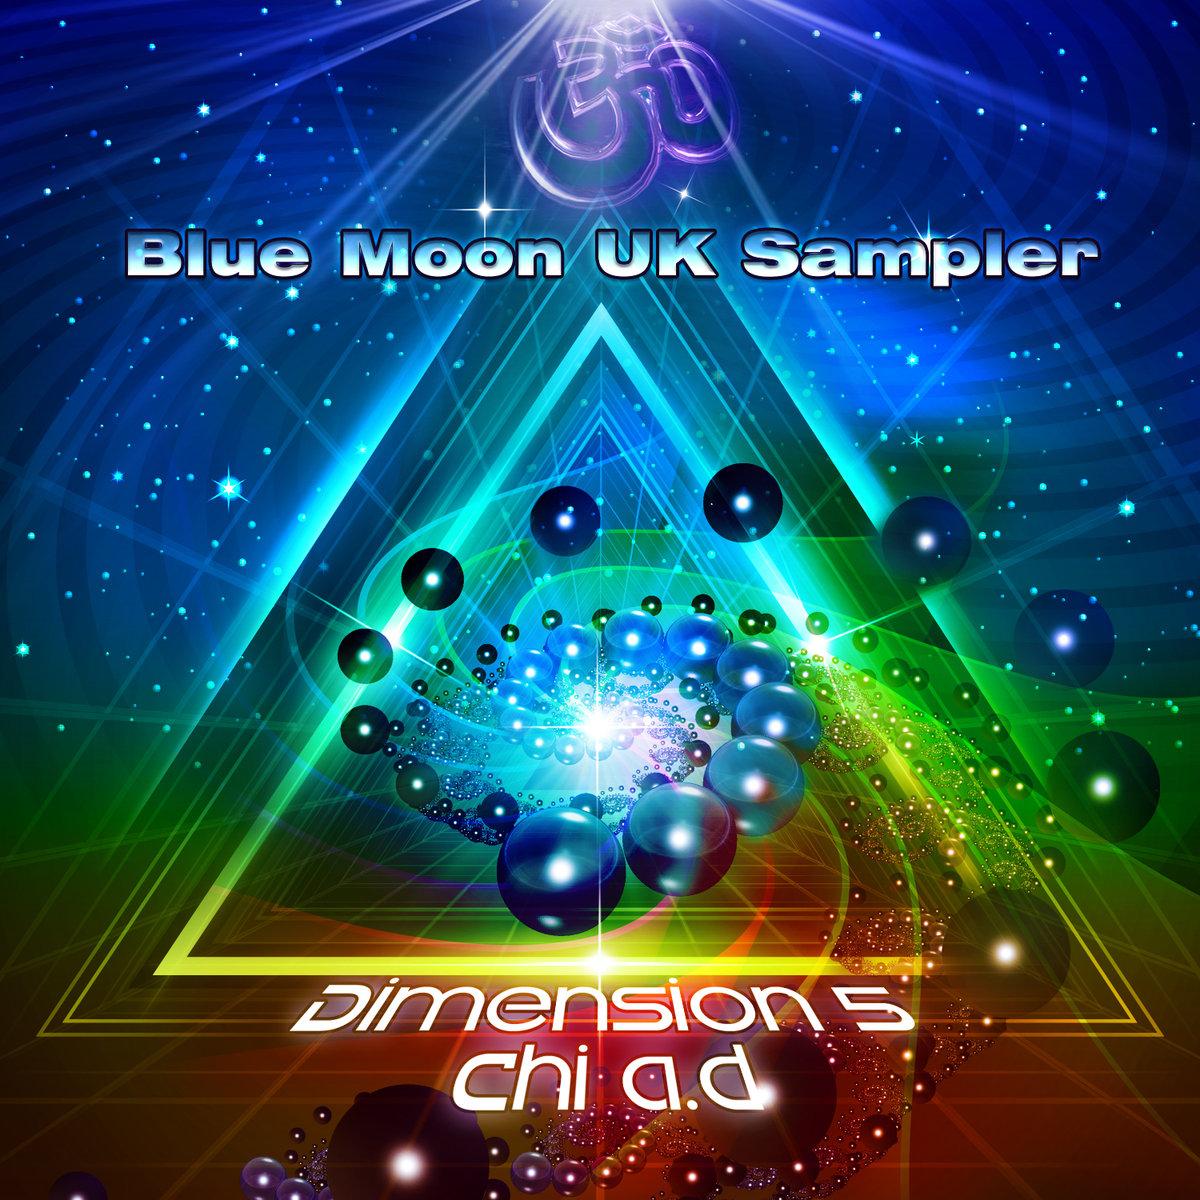 Dimension 5 / Chi-A.D. - Limitless Dimension (Original Unreleased Version) @ 'Blue Moon U.K. Sampler' album (blue moon uk sampler flac, chi ad flac)